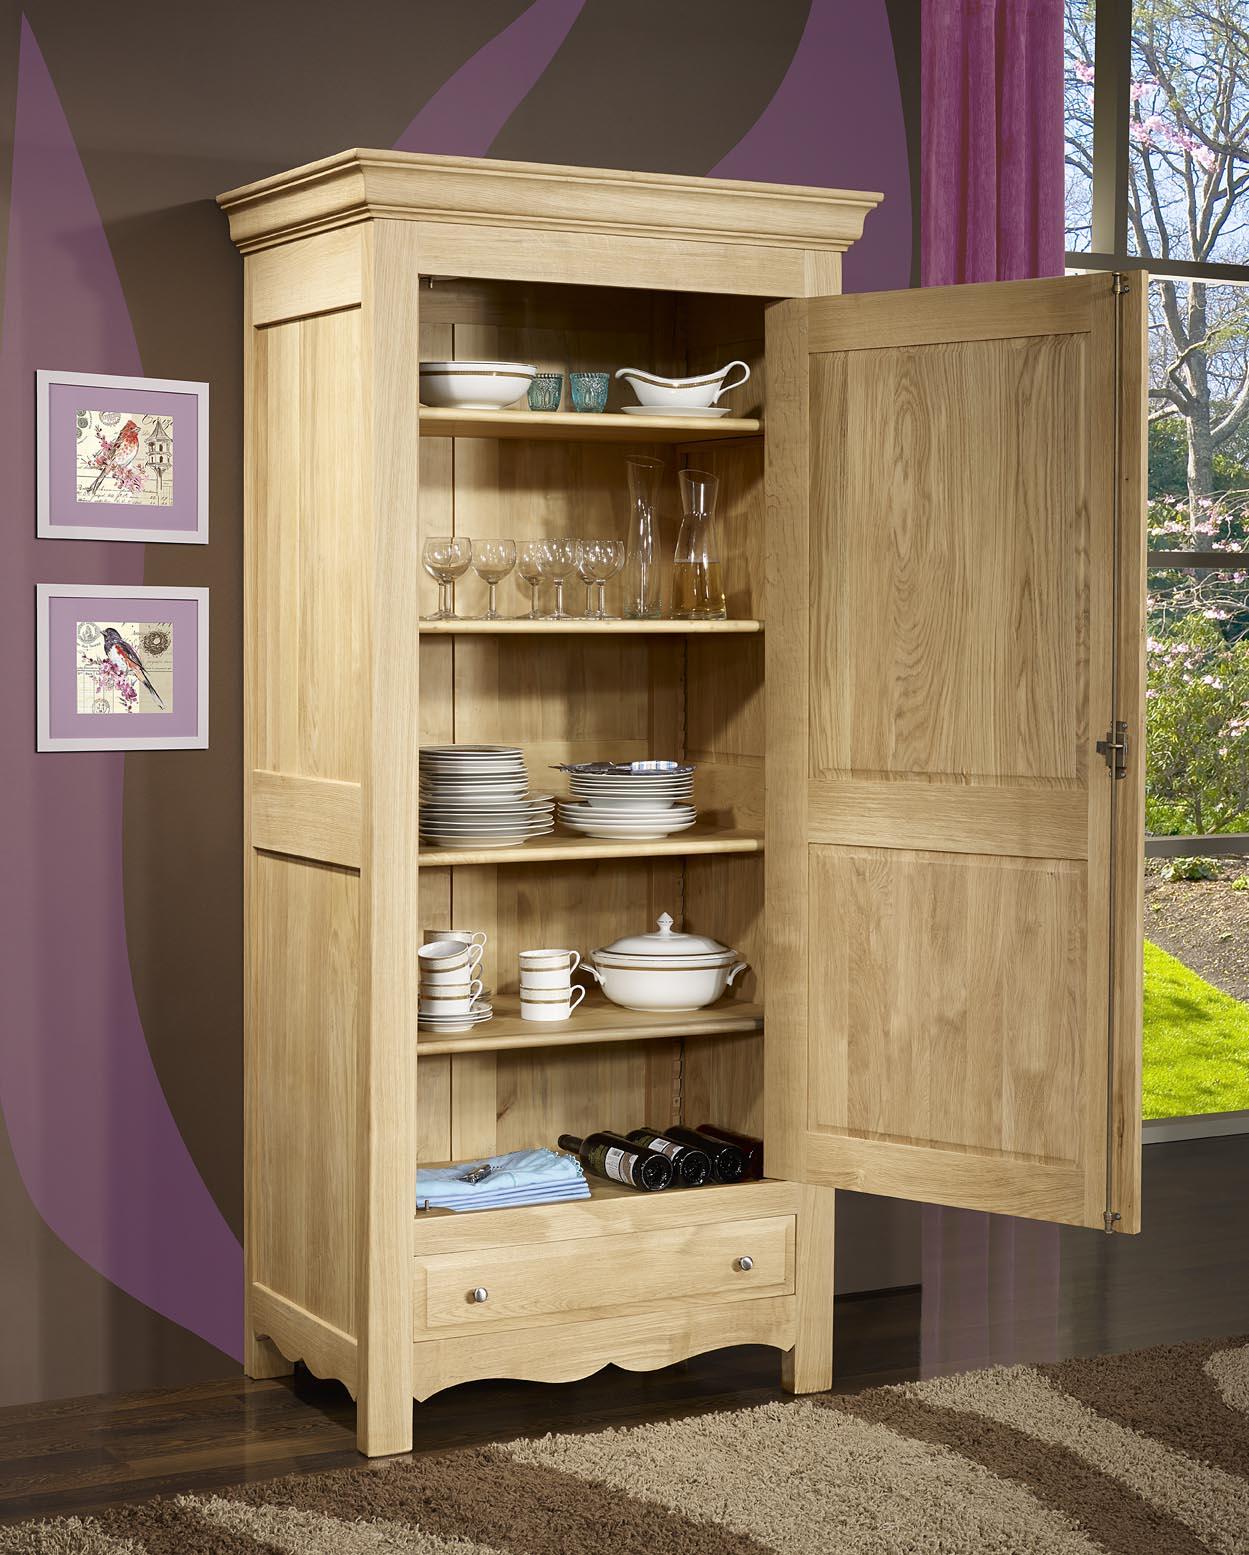 bonneti re 1 porte 1 tiroir en ch ne massif de style campagnard meuble en ch ne. Black Bedroom Furniture Sets. Home Design Ideas